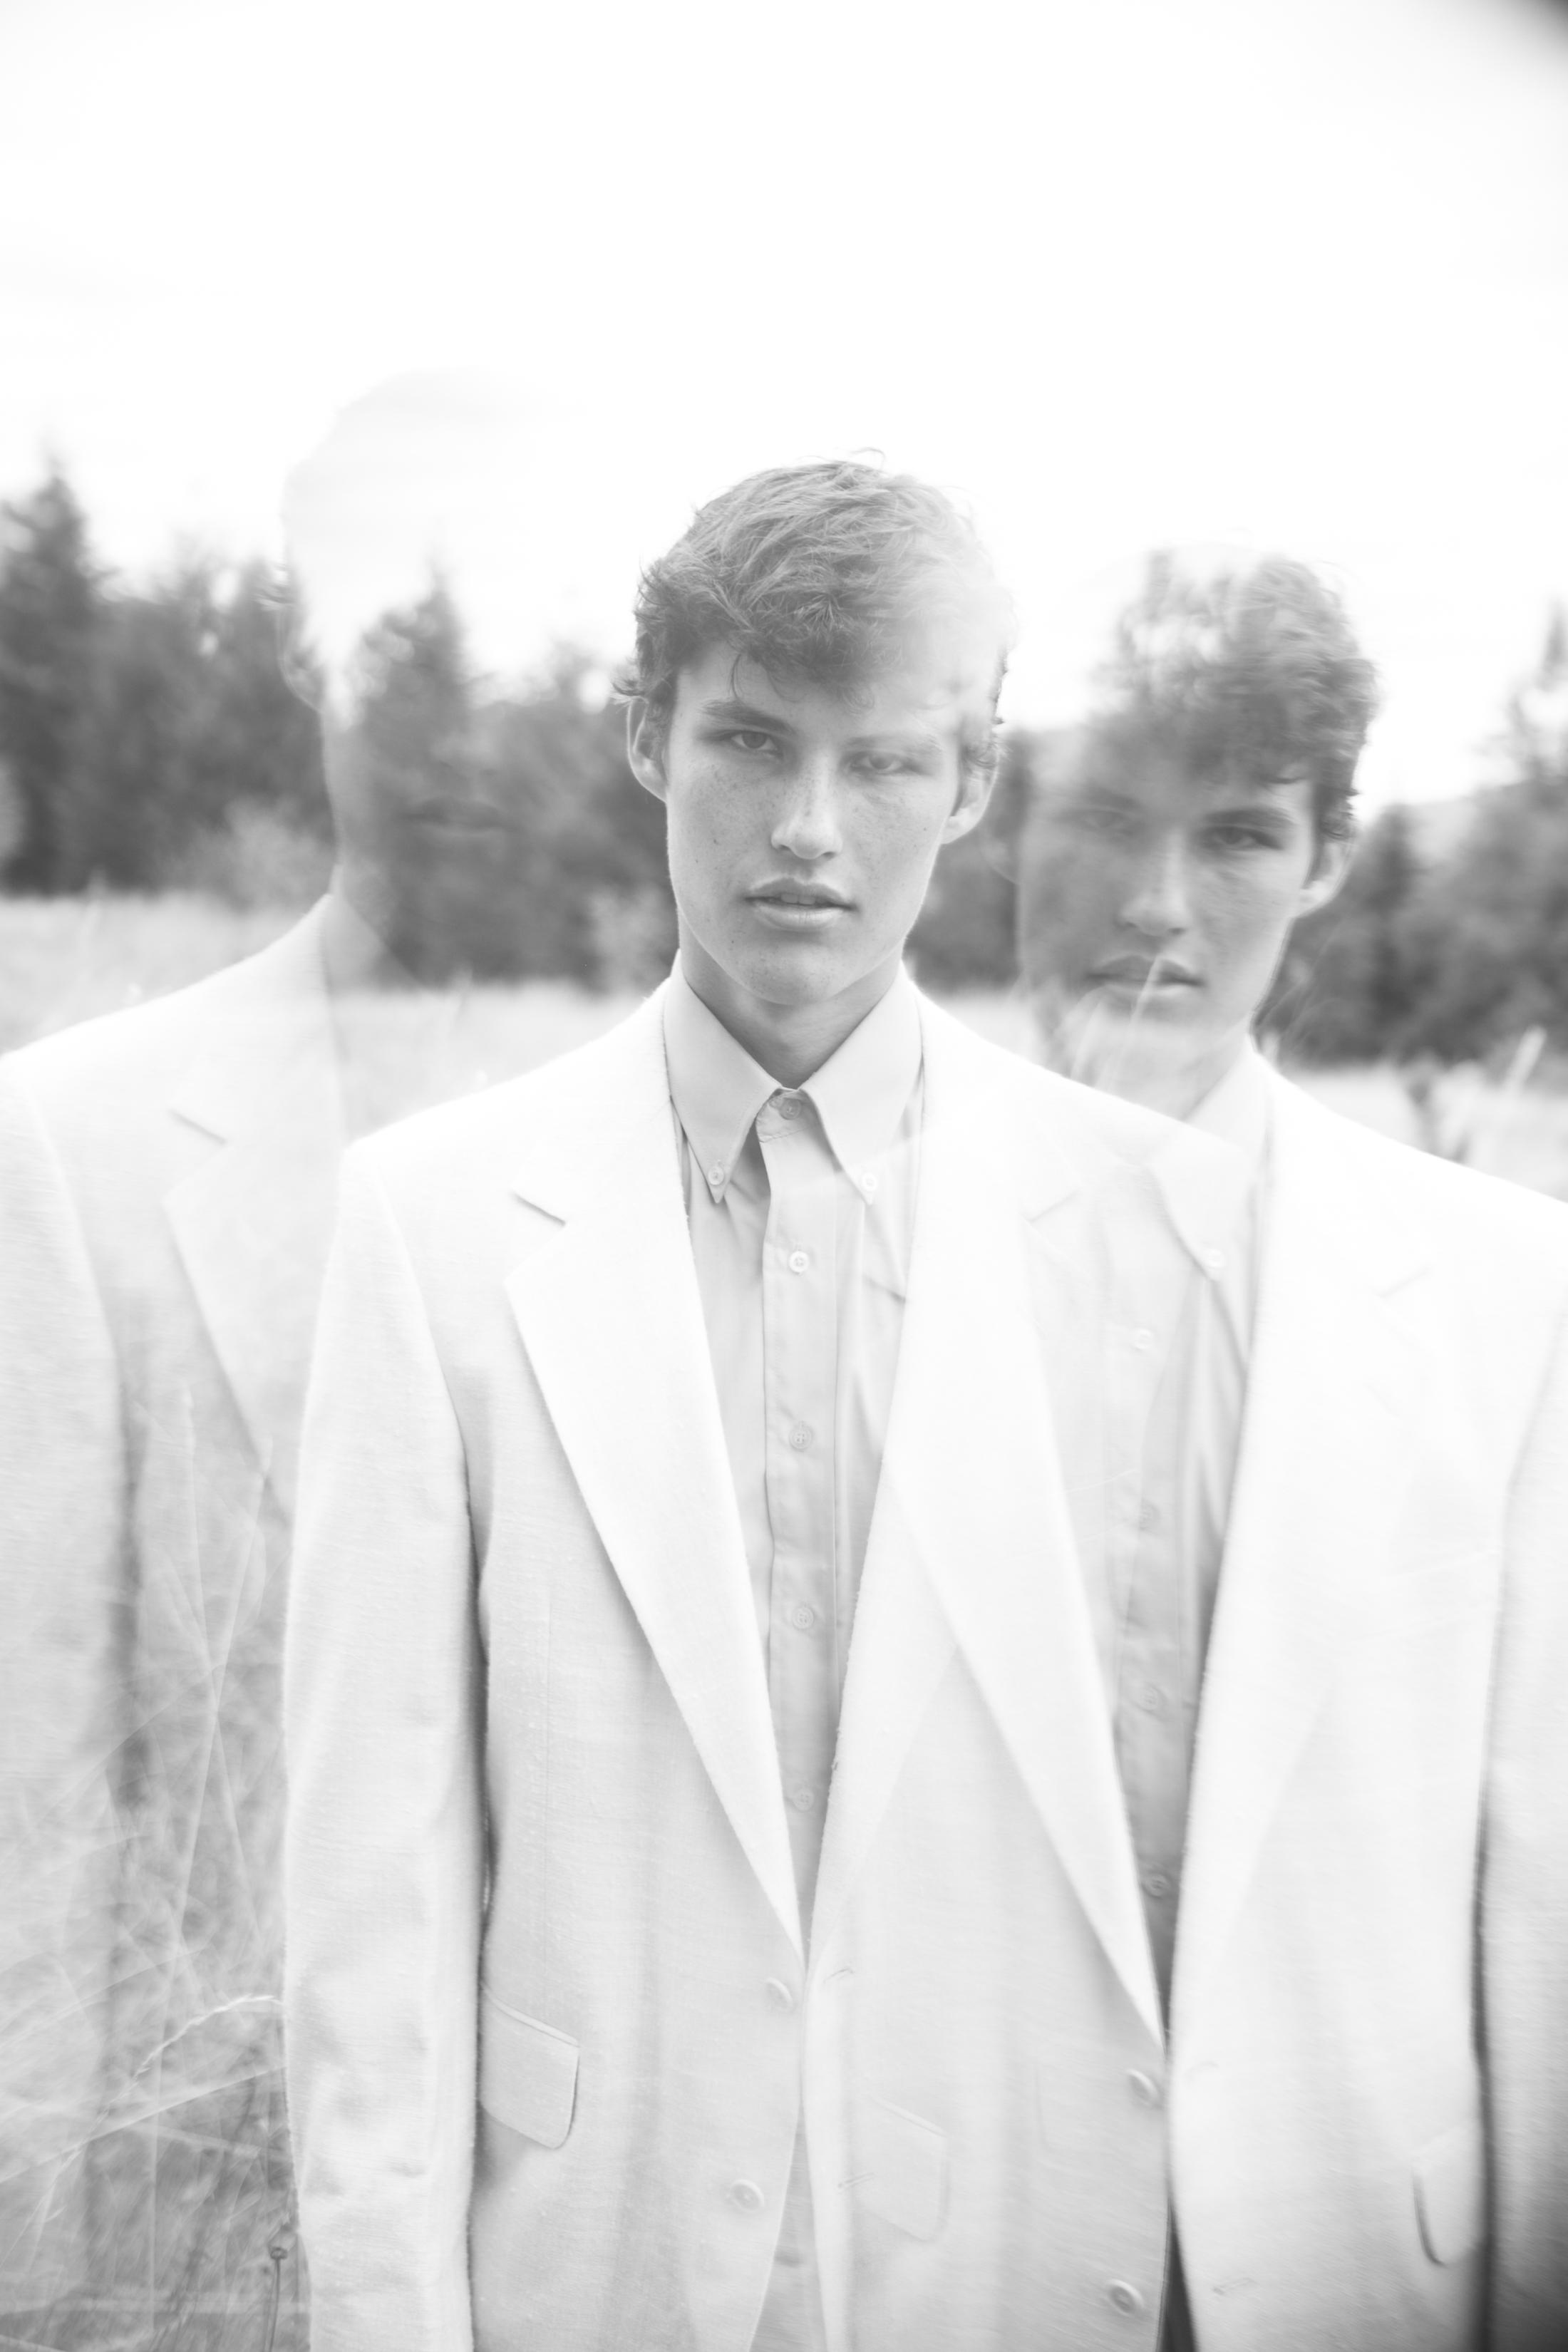 IN REFLECTIONS - photography Alexa Jademodel Brent Barzler @ Option Models#StarkMag